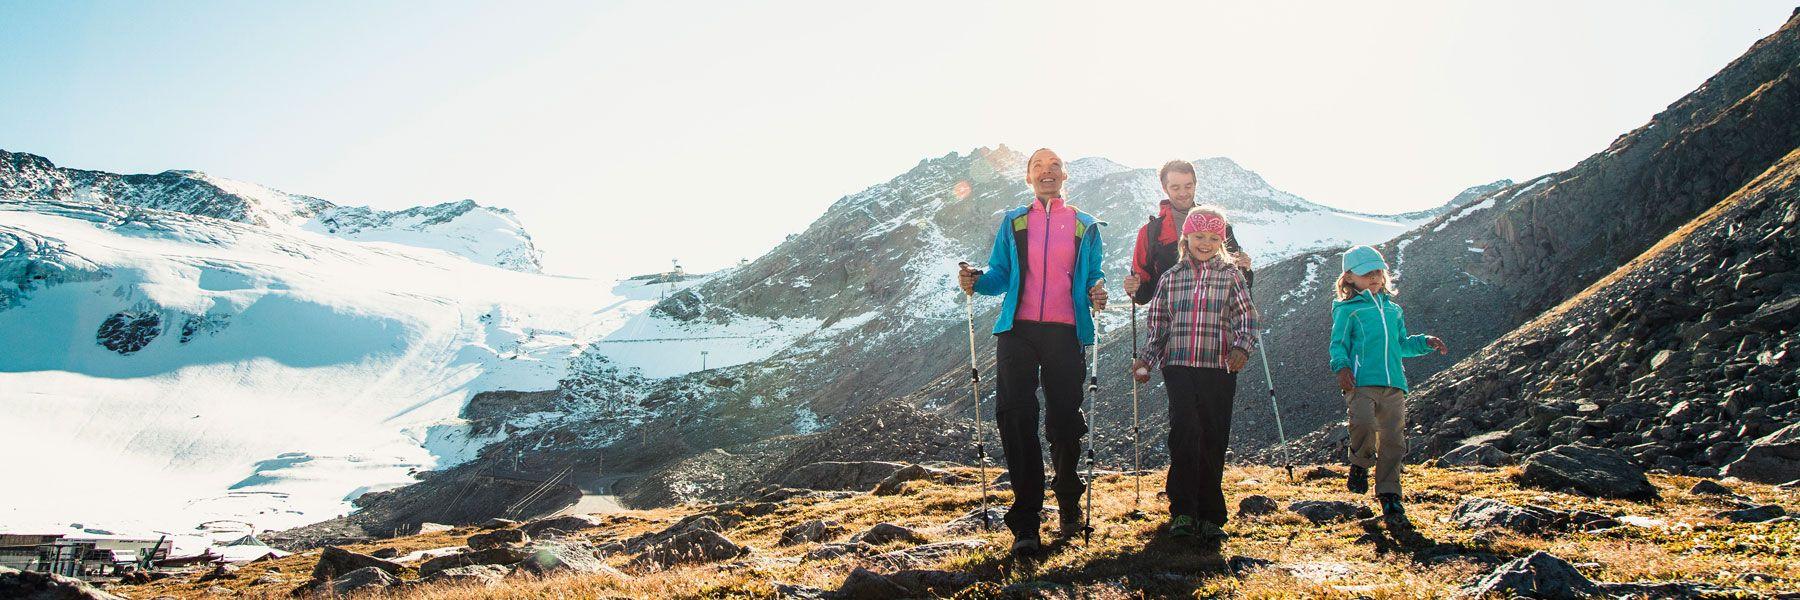 Wandern in den Ötztaler Bergen